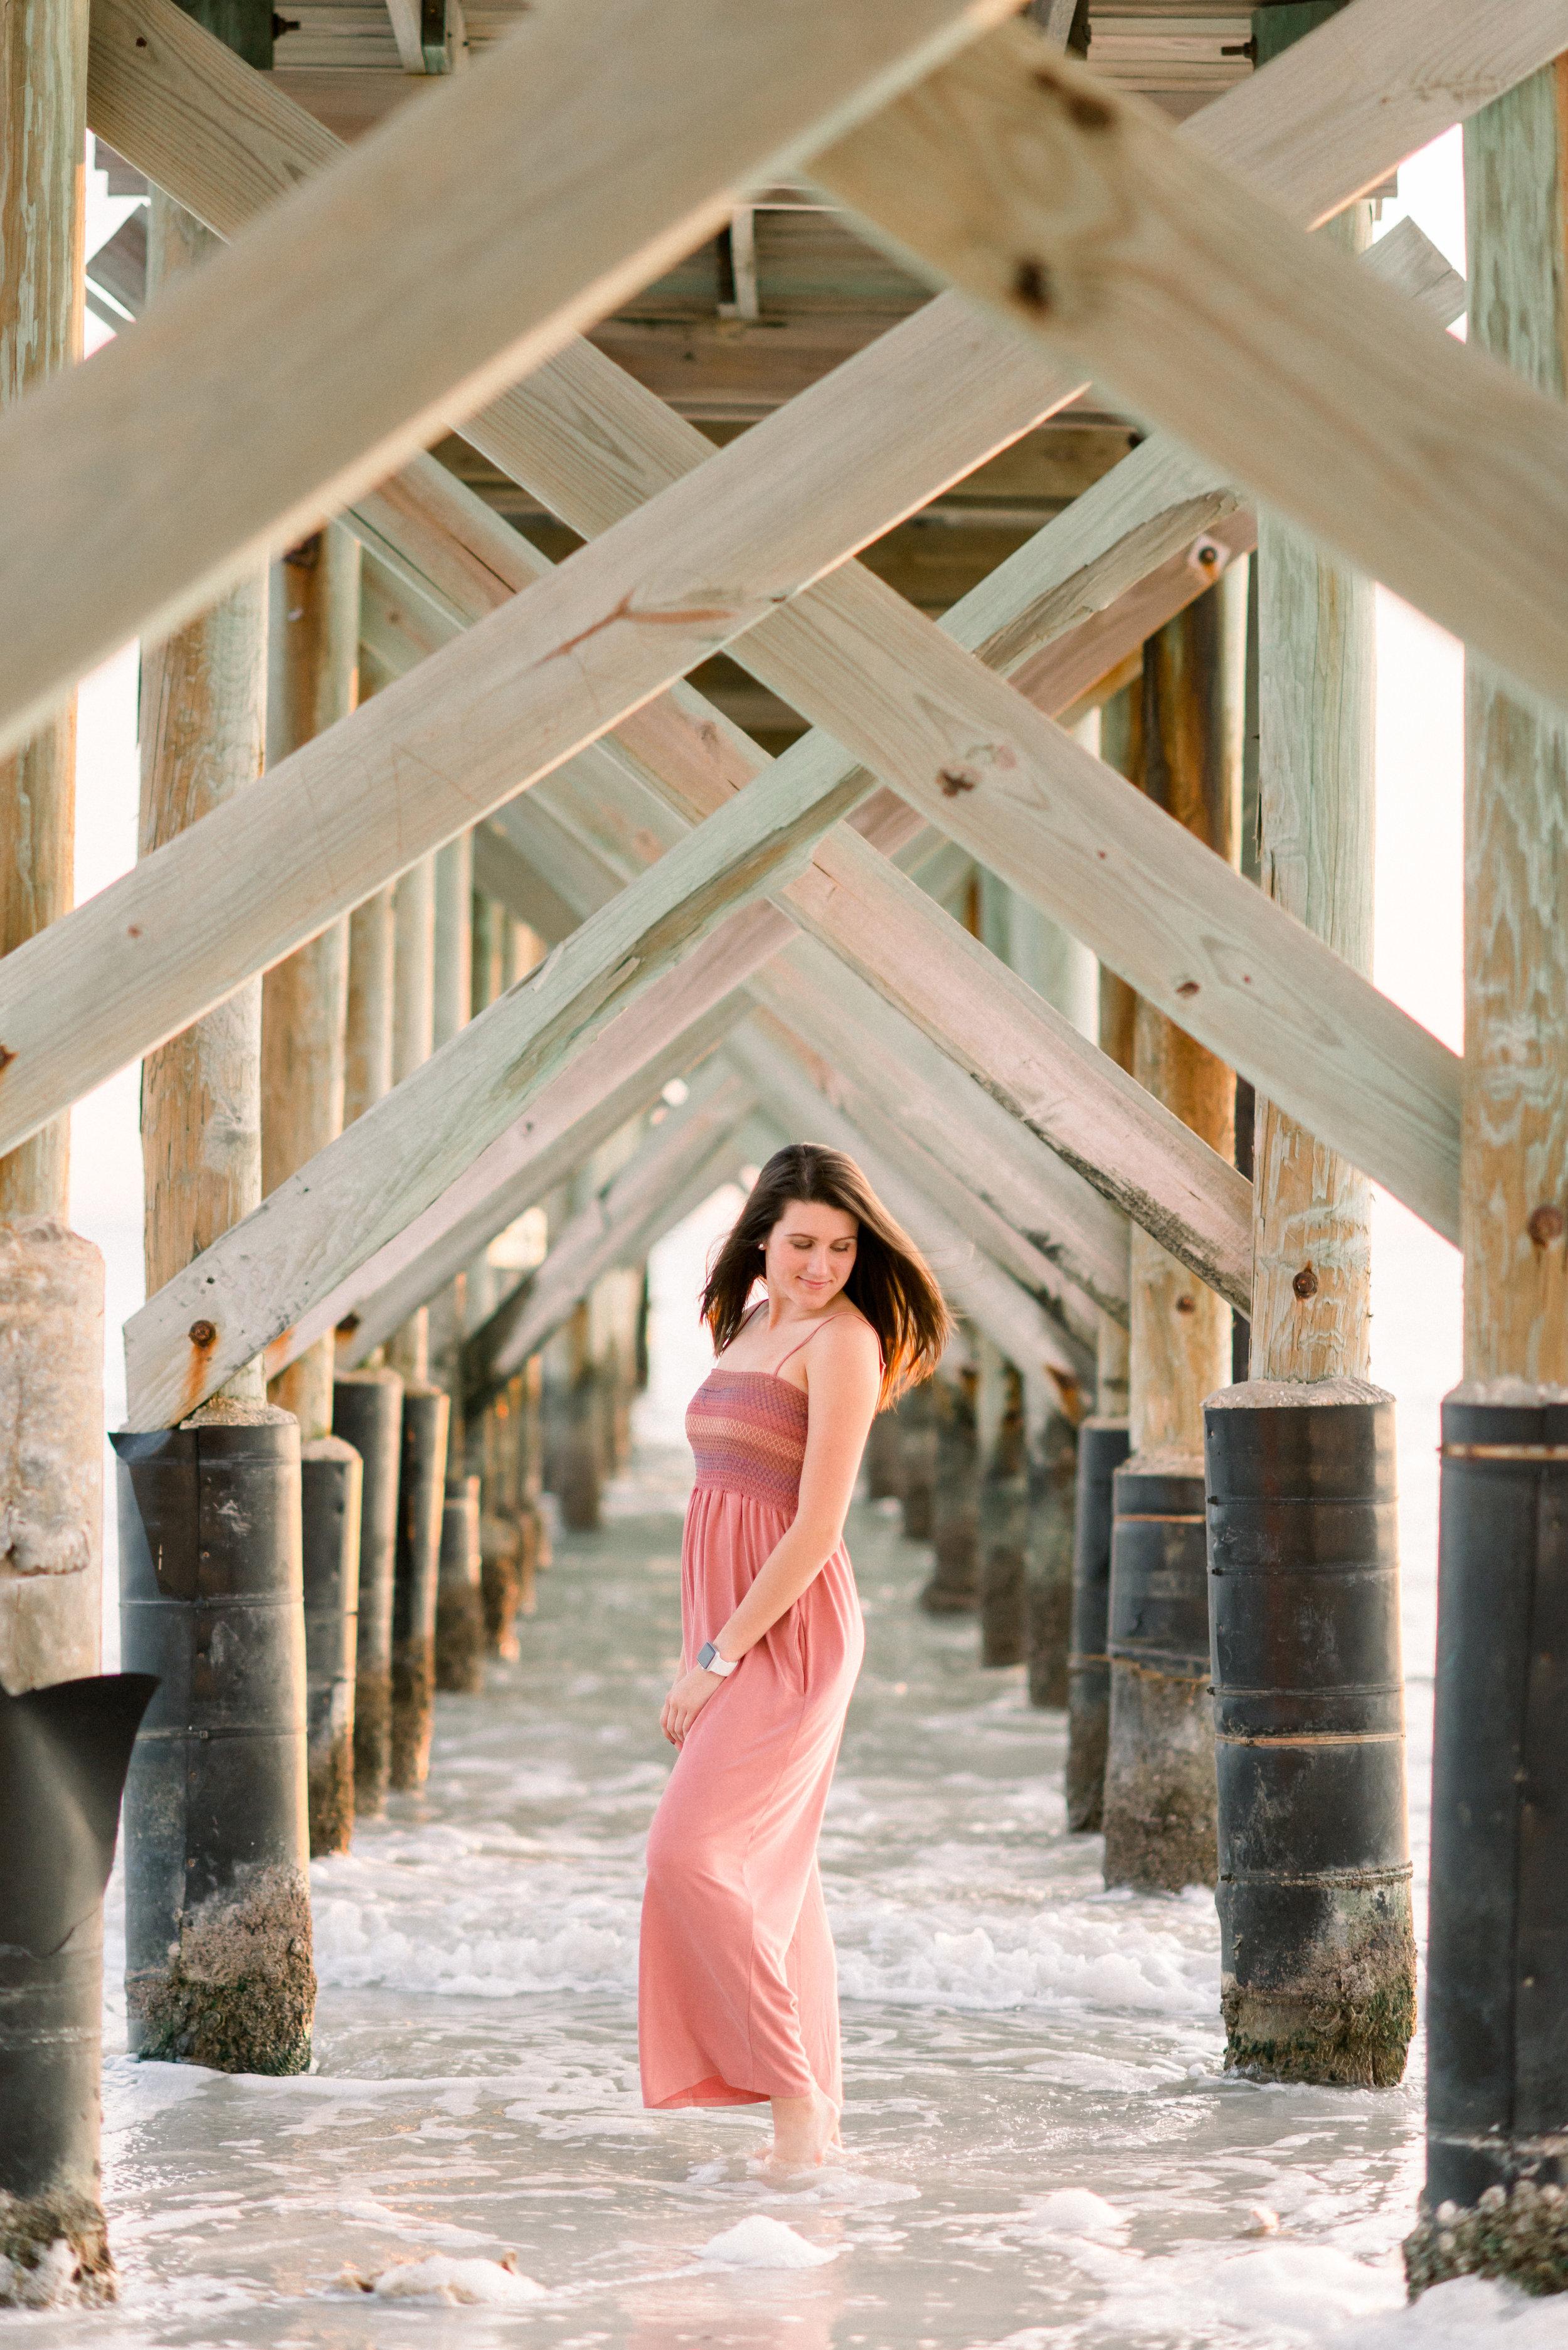 KateTaramykinStudios-Tampa-Senior-Portraits-Cameron-33.jpg